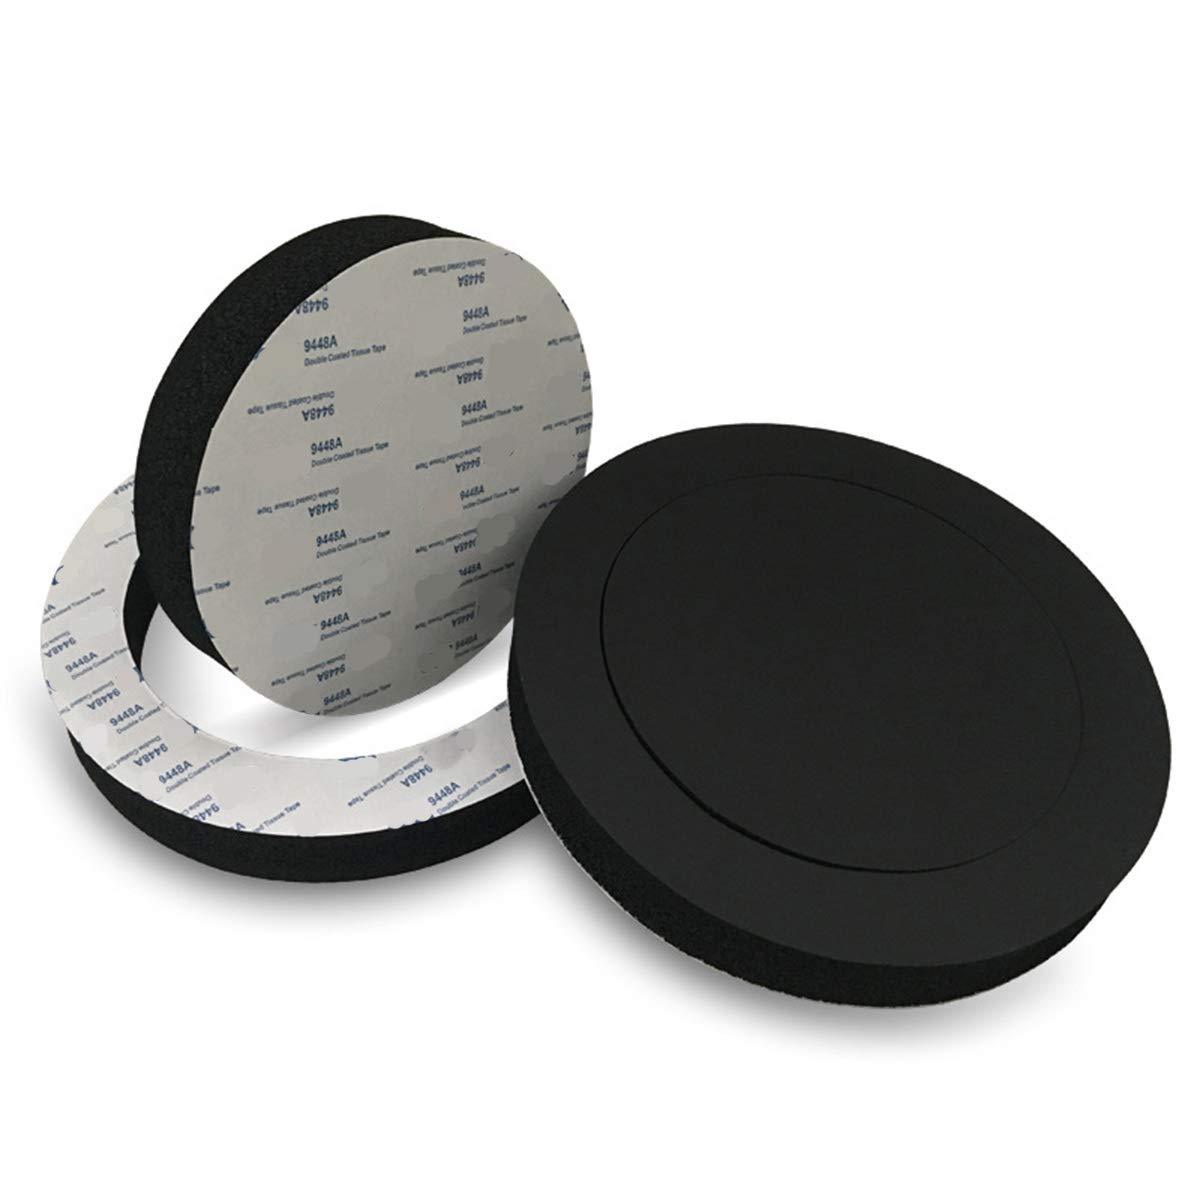 "3 Pack 3X 6.5 Car Door Foam Speaker Enhancer System Sponge Kit Fast Foam Rings Bass Blocker Soundproof Spong Stereo Foam for 6 6.5 6.75/"" 7 Coaxial Speakers Marine Speakers Spacer"